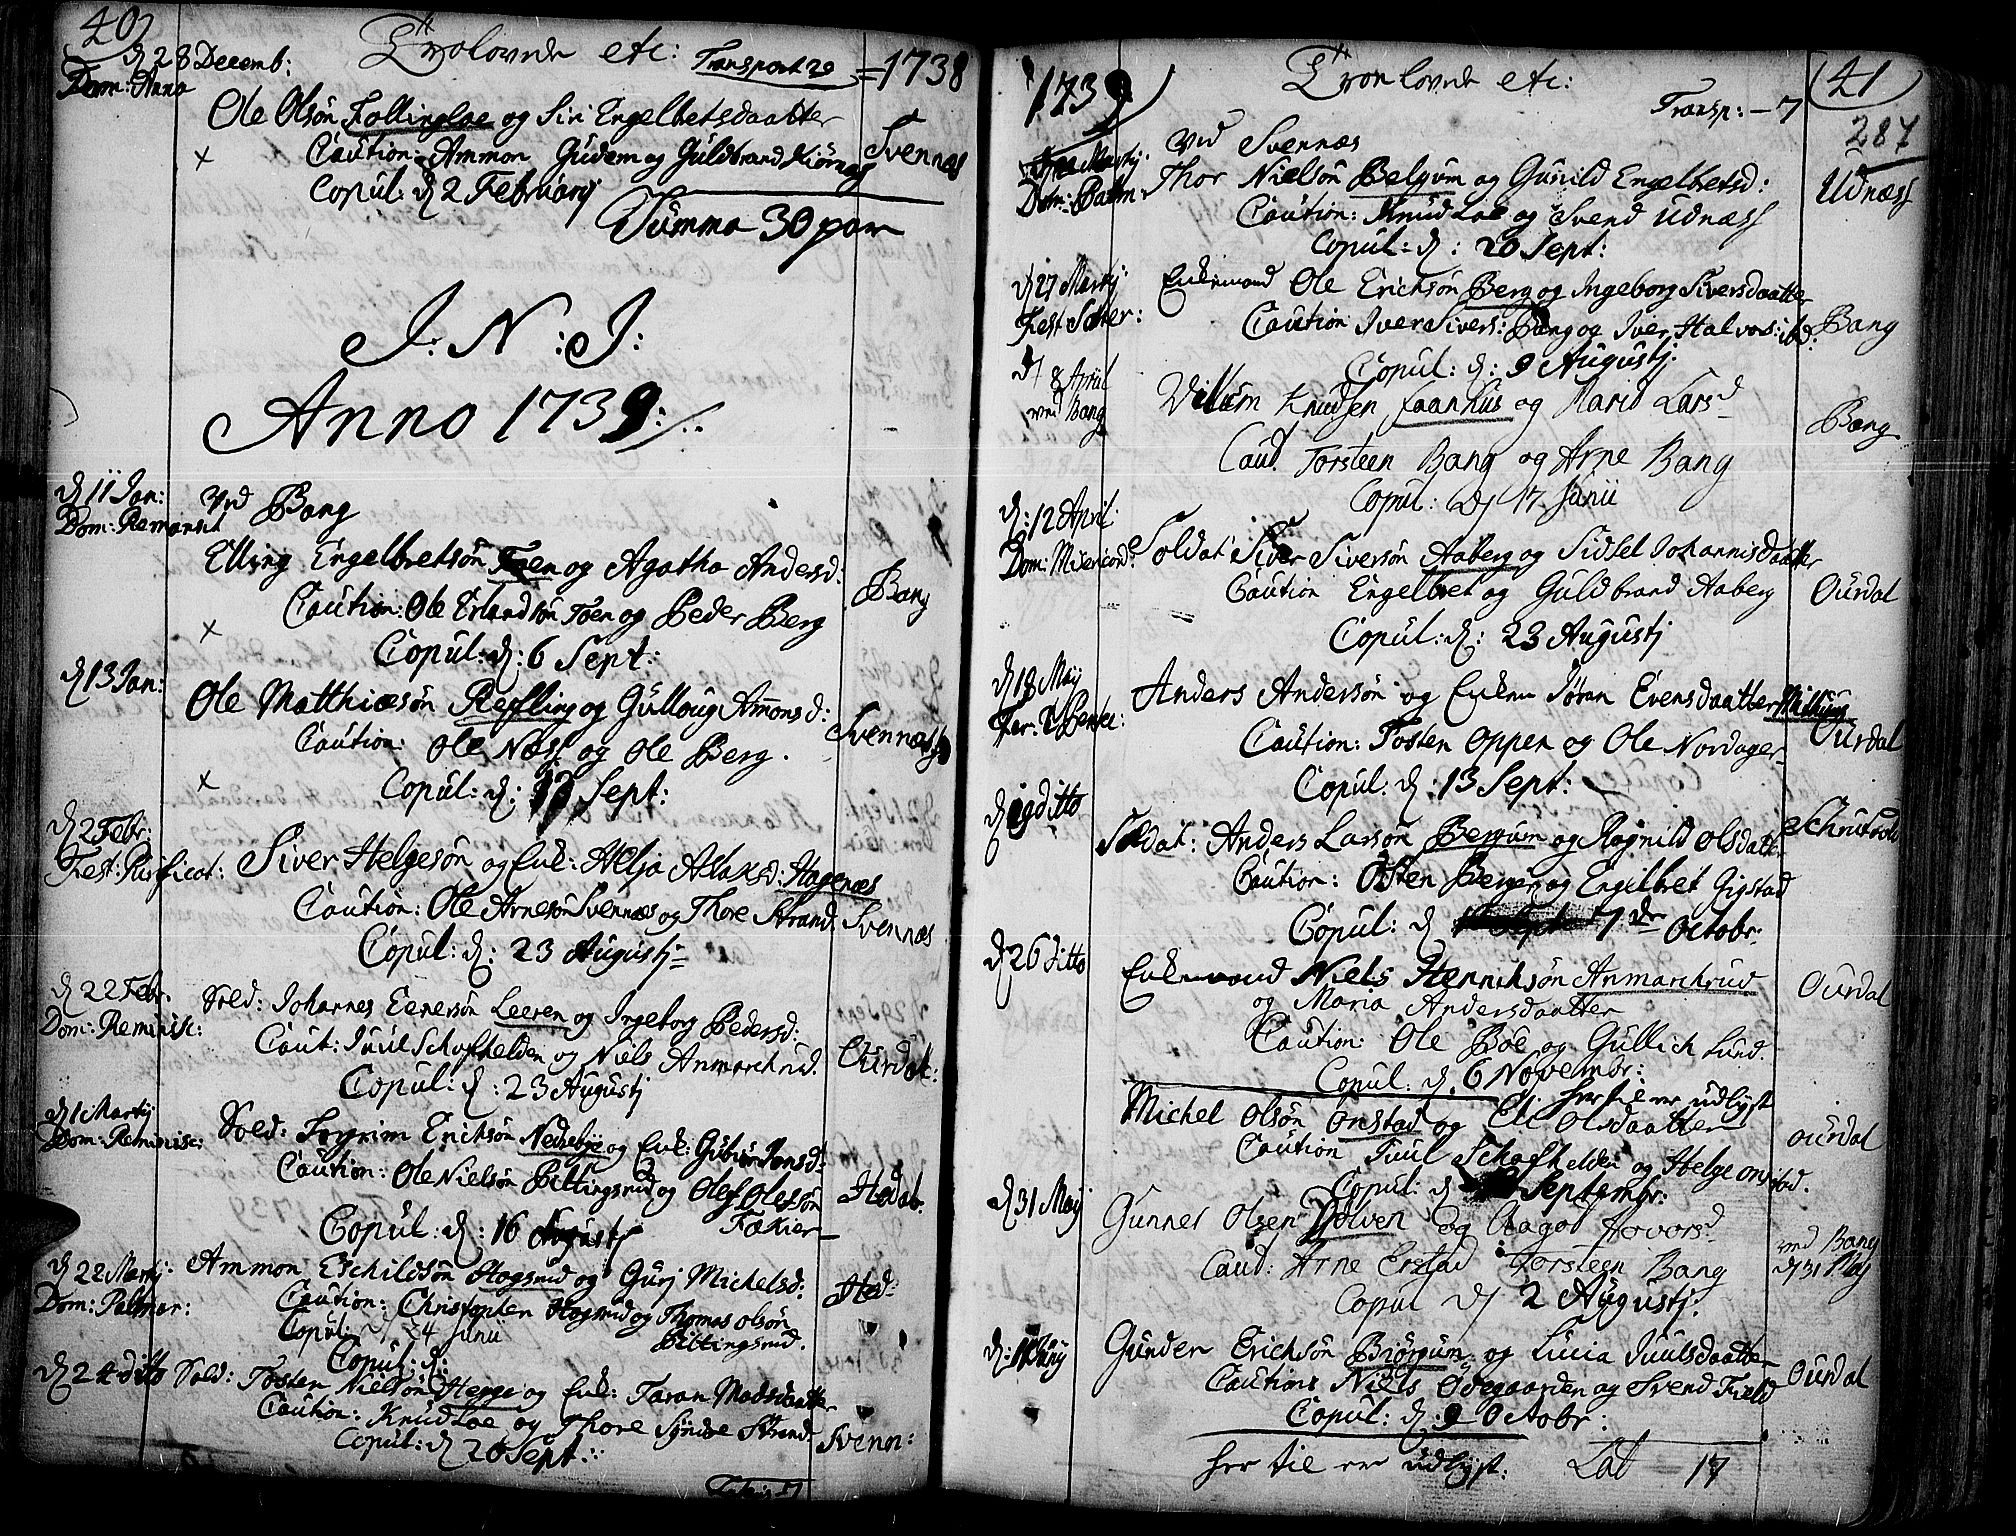 SAH, Aurdal prestekontor, Ministerialbok nr. 4, 1730-1762, s. 40-41